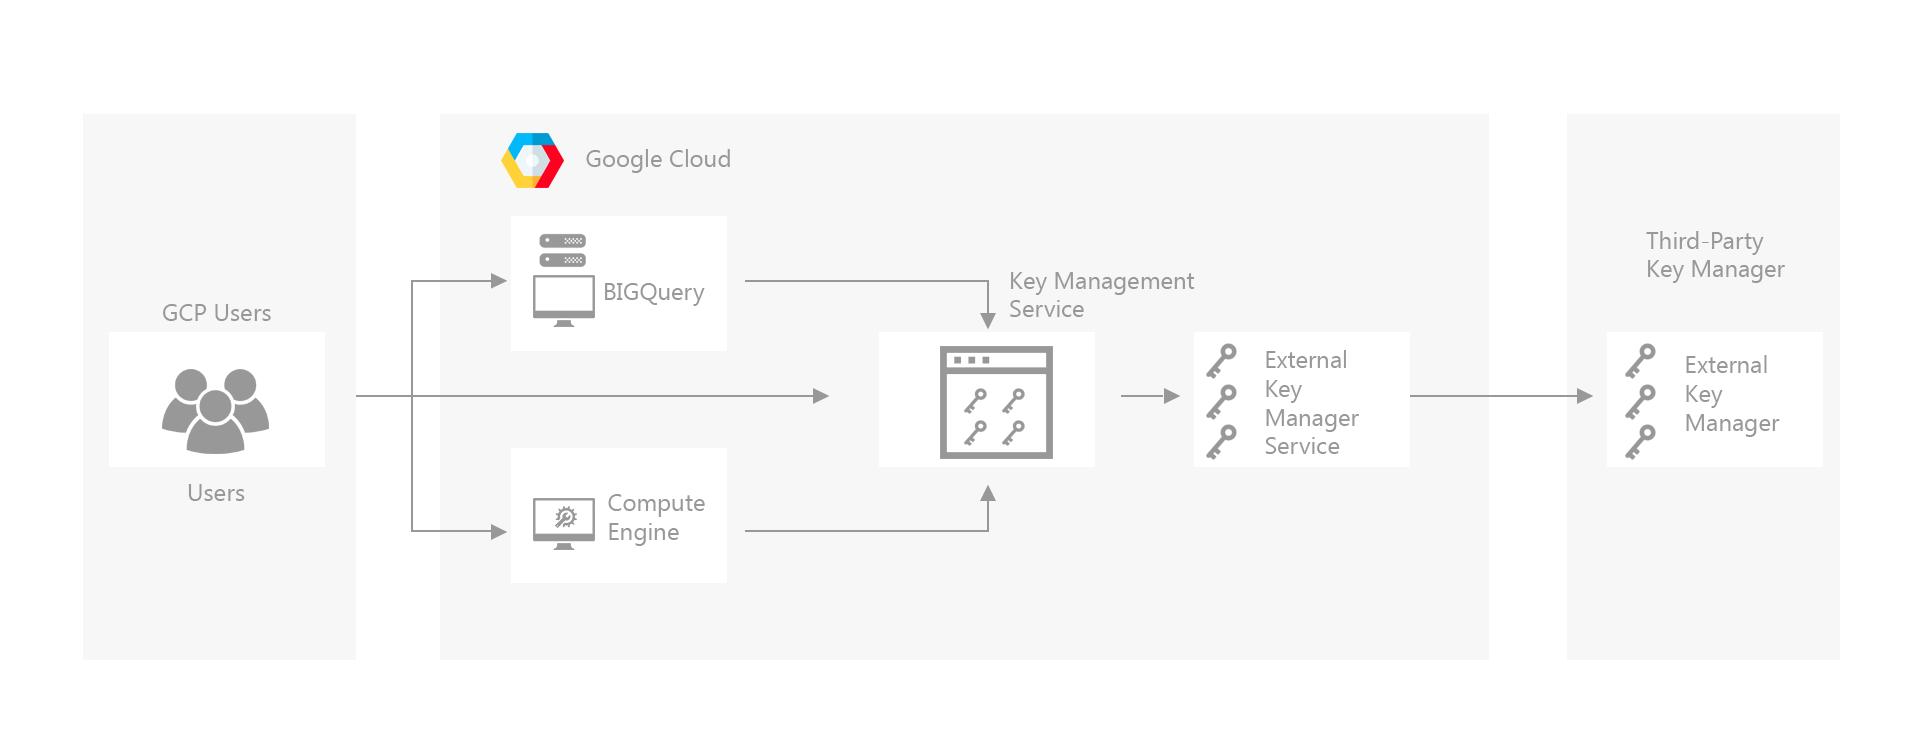 Cloud-EKM-providing-bridge-between-KMS-and-External-Key-Manager (1)